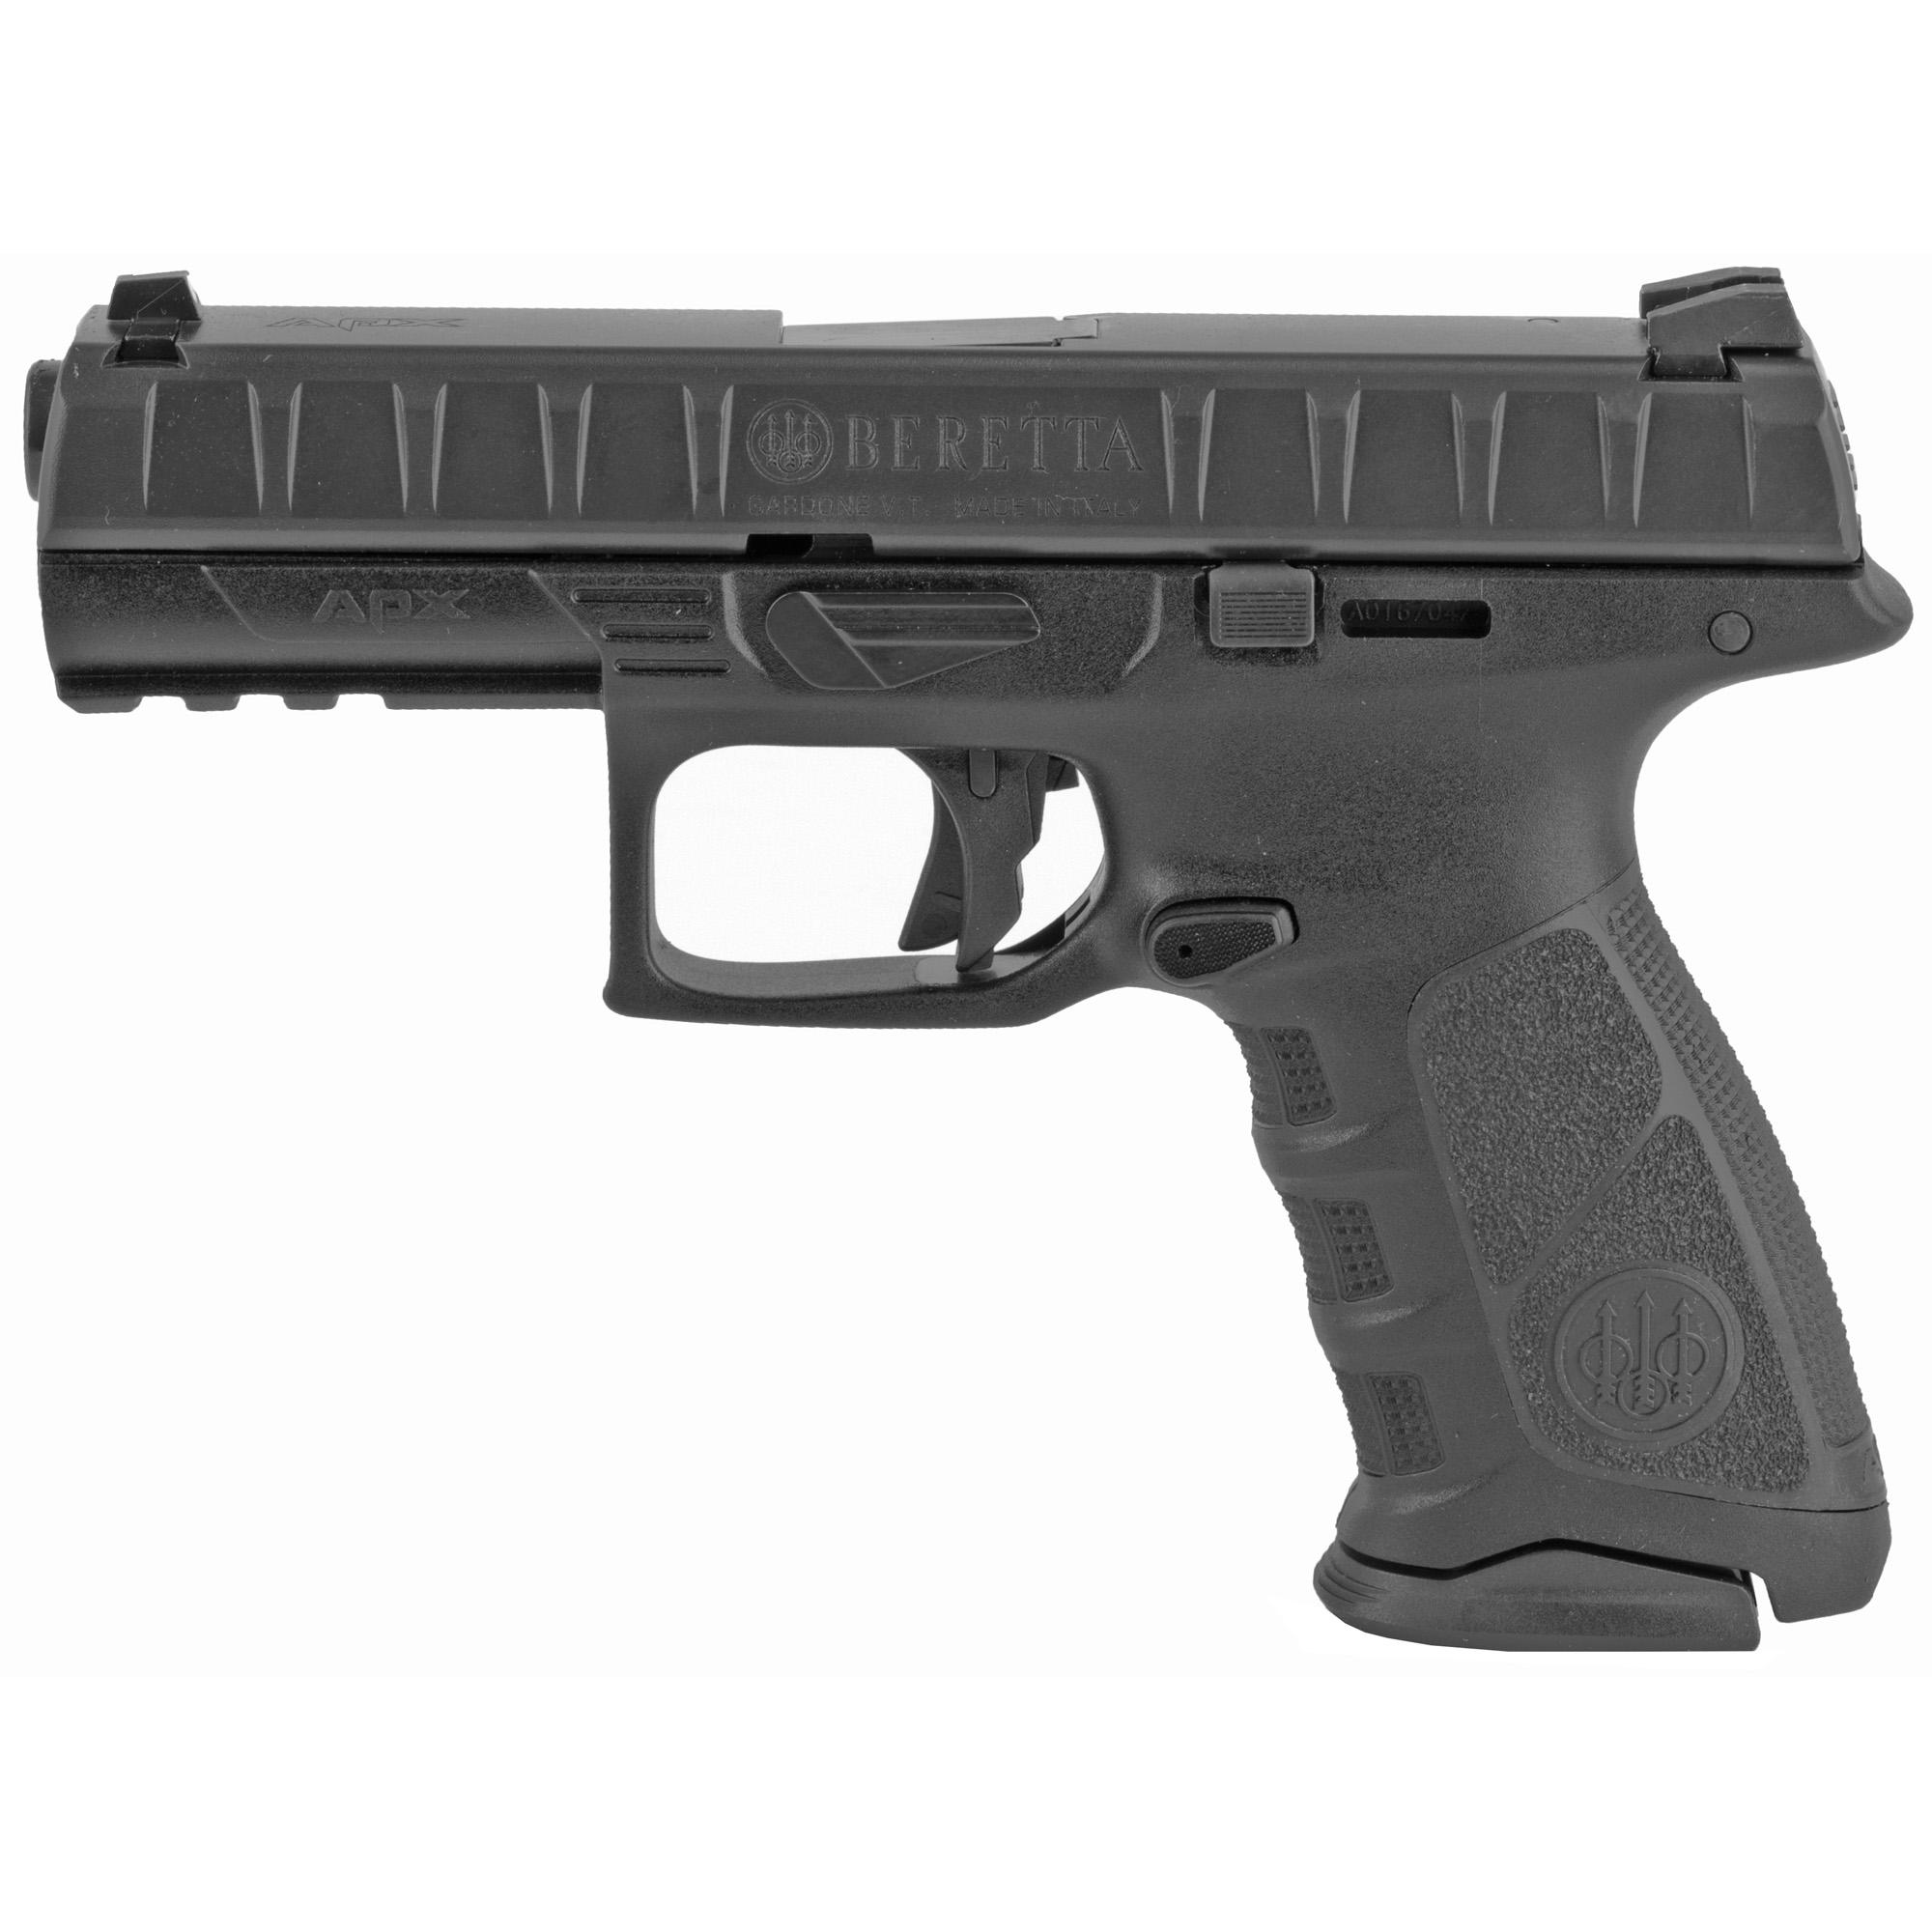 "Beretta Apx 9mm 4.25"" Blk 10rd Blem"